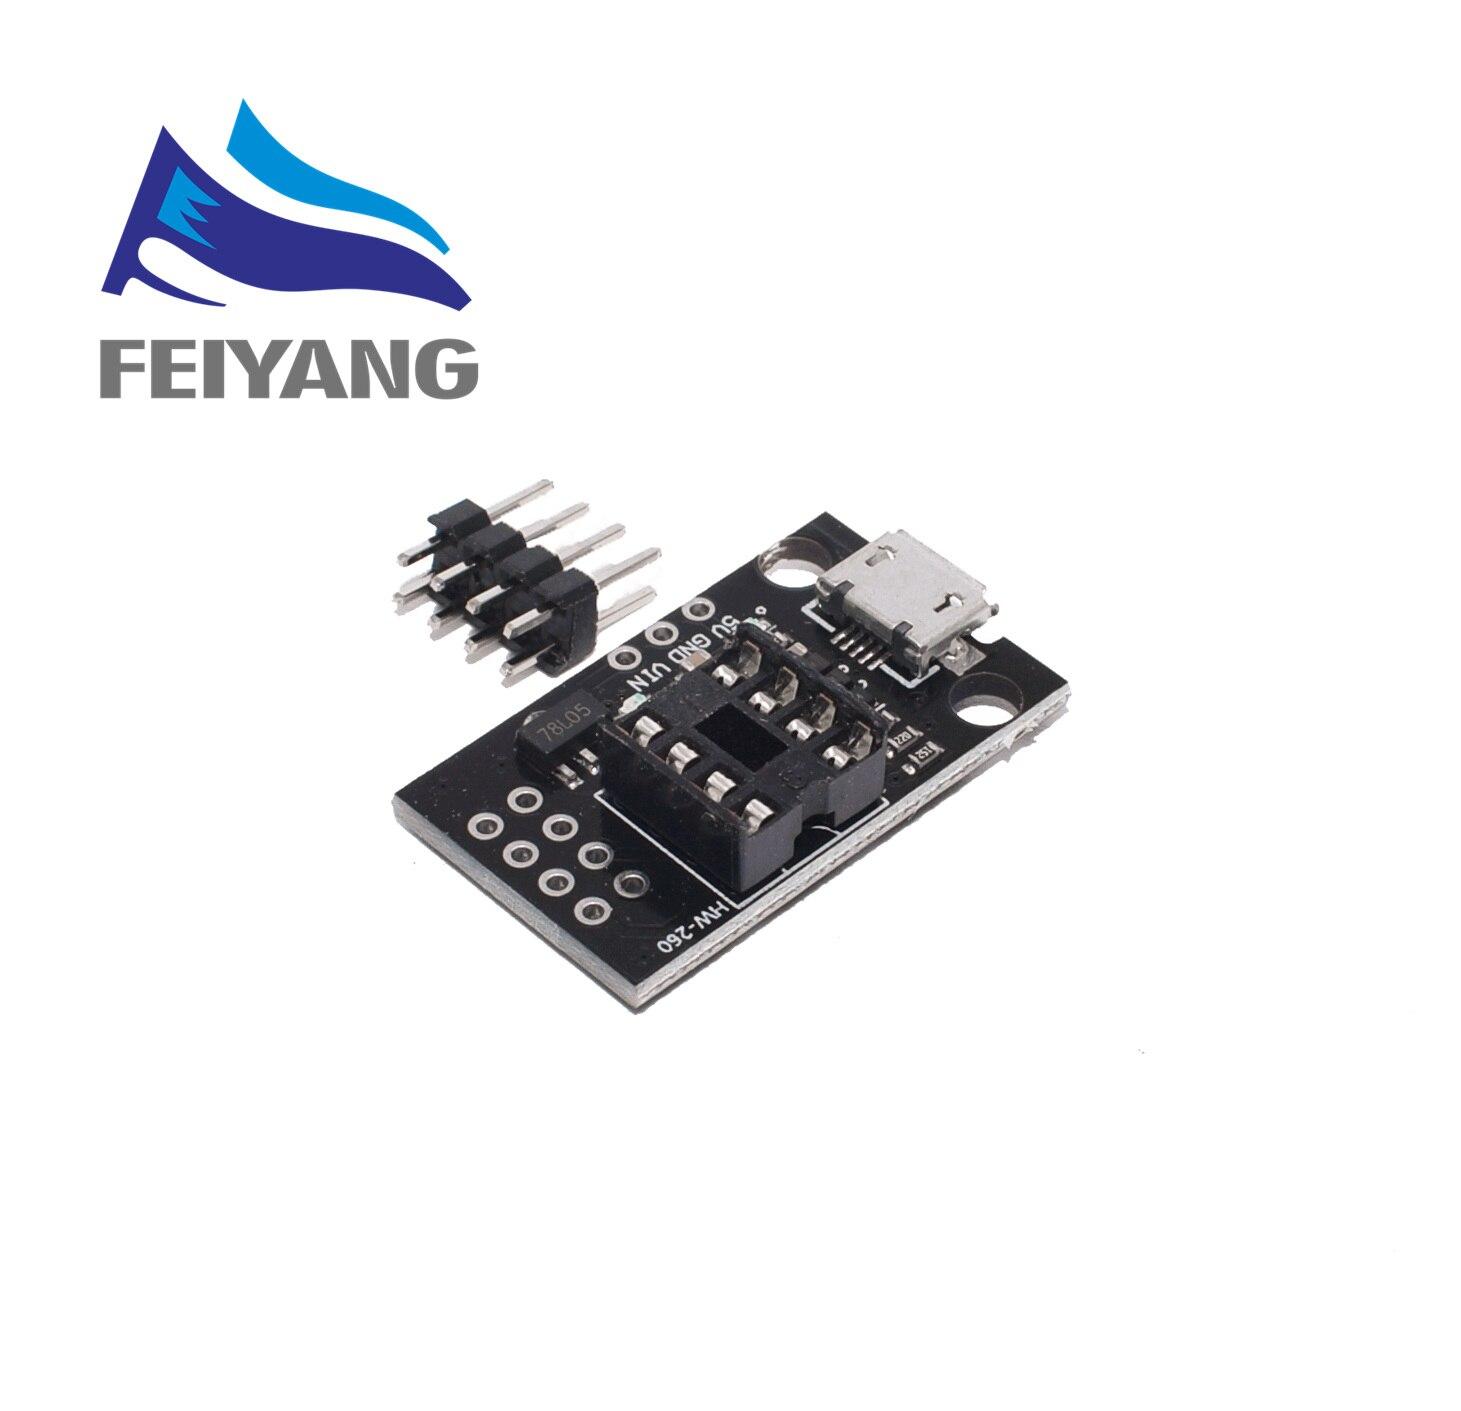 1 шт. синий черный TINY85 Digispark Kickstarter микро макетная плата ATTINY85 модуль для Arduino IIC IEC USB